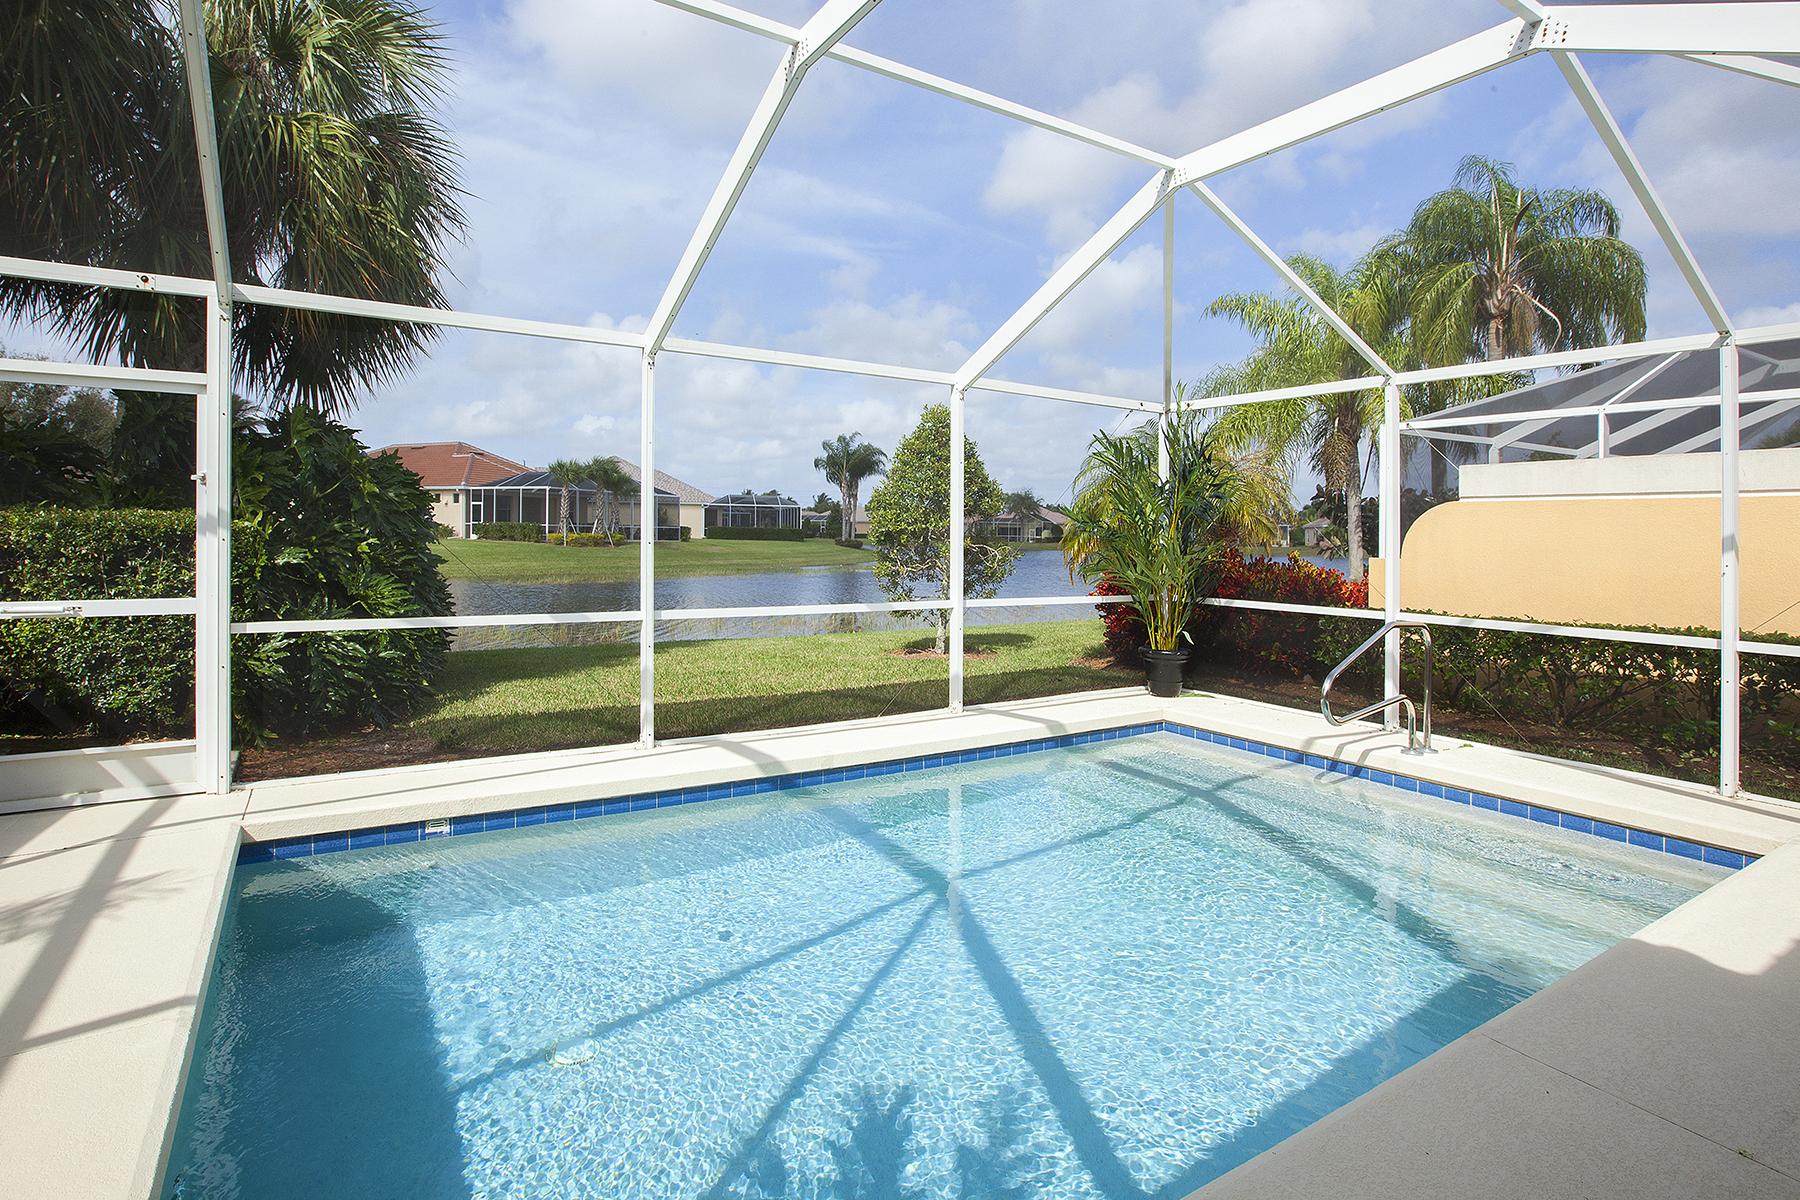 Residência urbana para Venda às NAPLES - VERONA WALK 7127 Marconi Ct Naples, Florida 34114 Estados Unidos